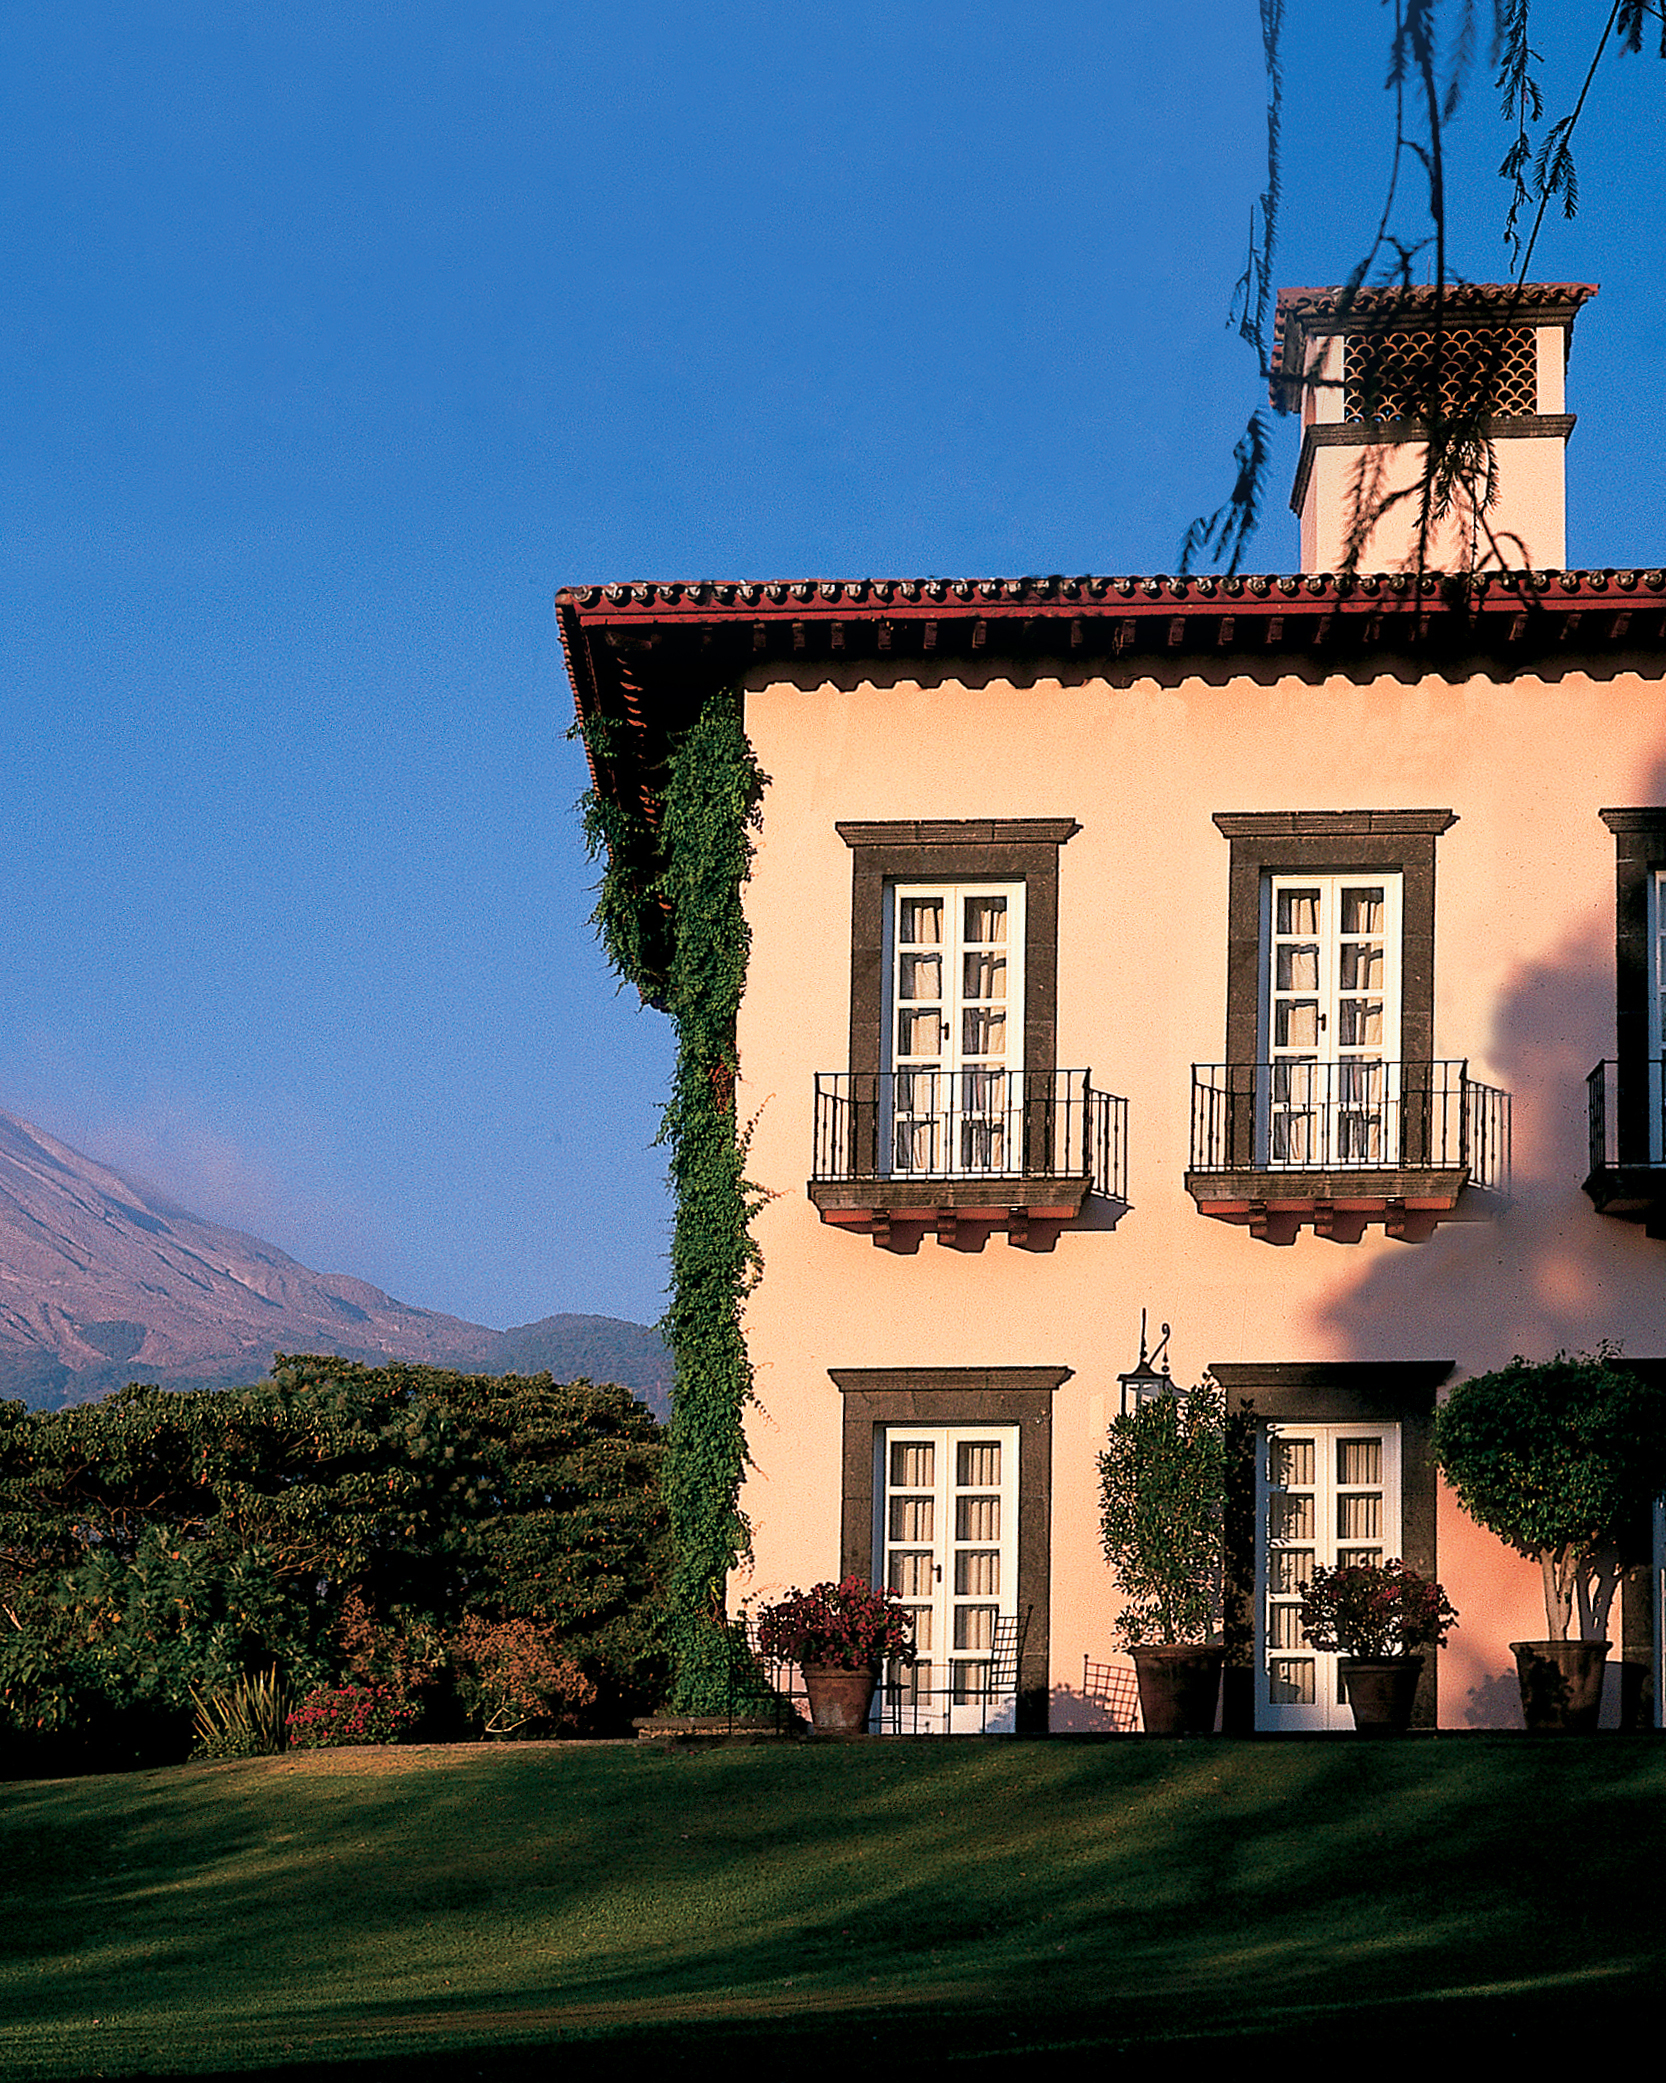 mr-mrs-smith-travel-hotels-wd0413-hacienda-de-san-antonio.jpg